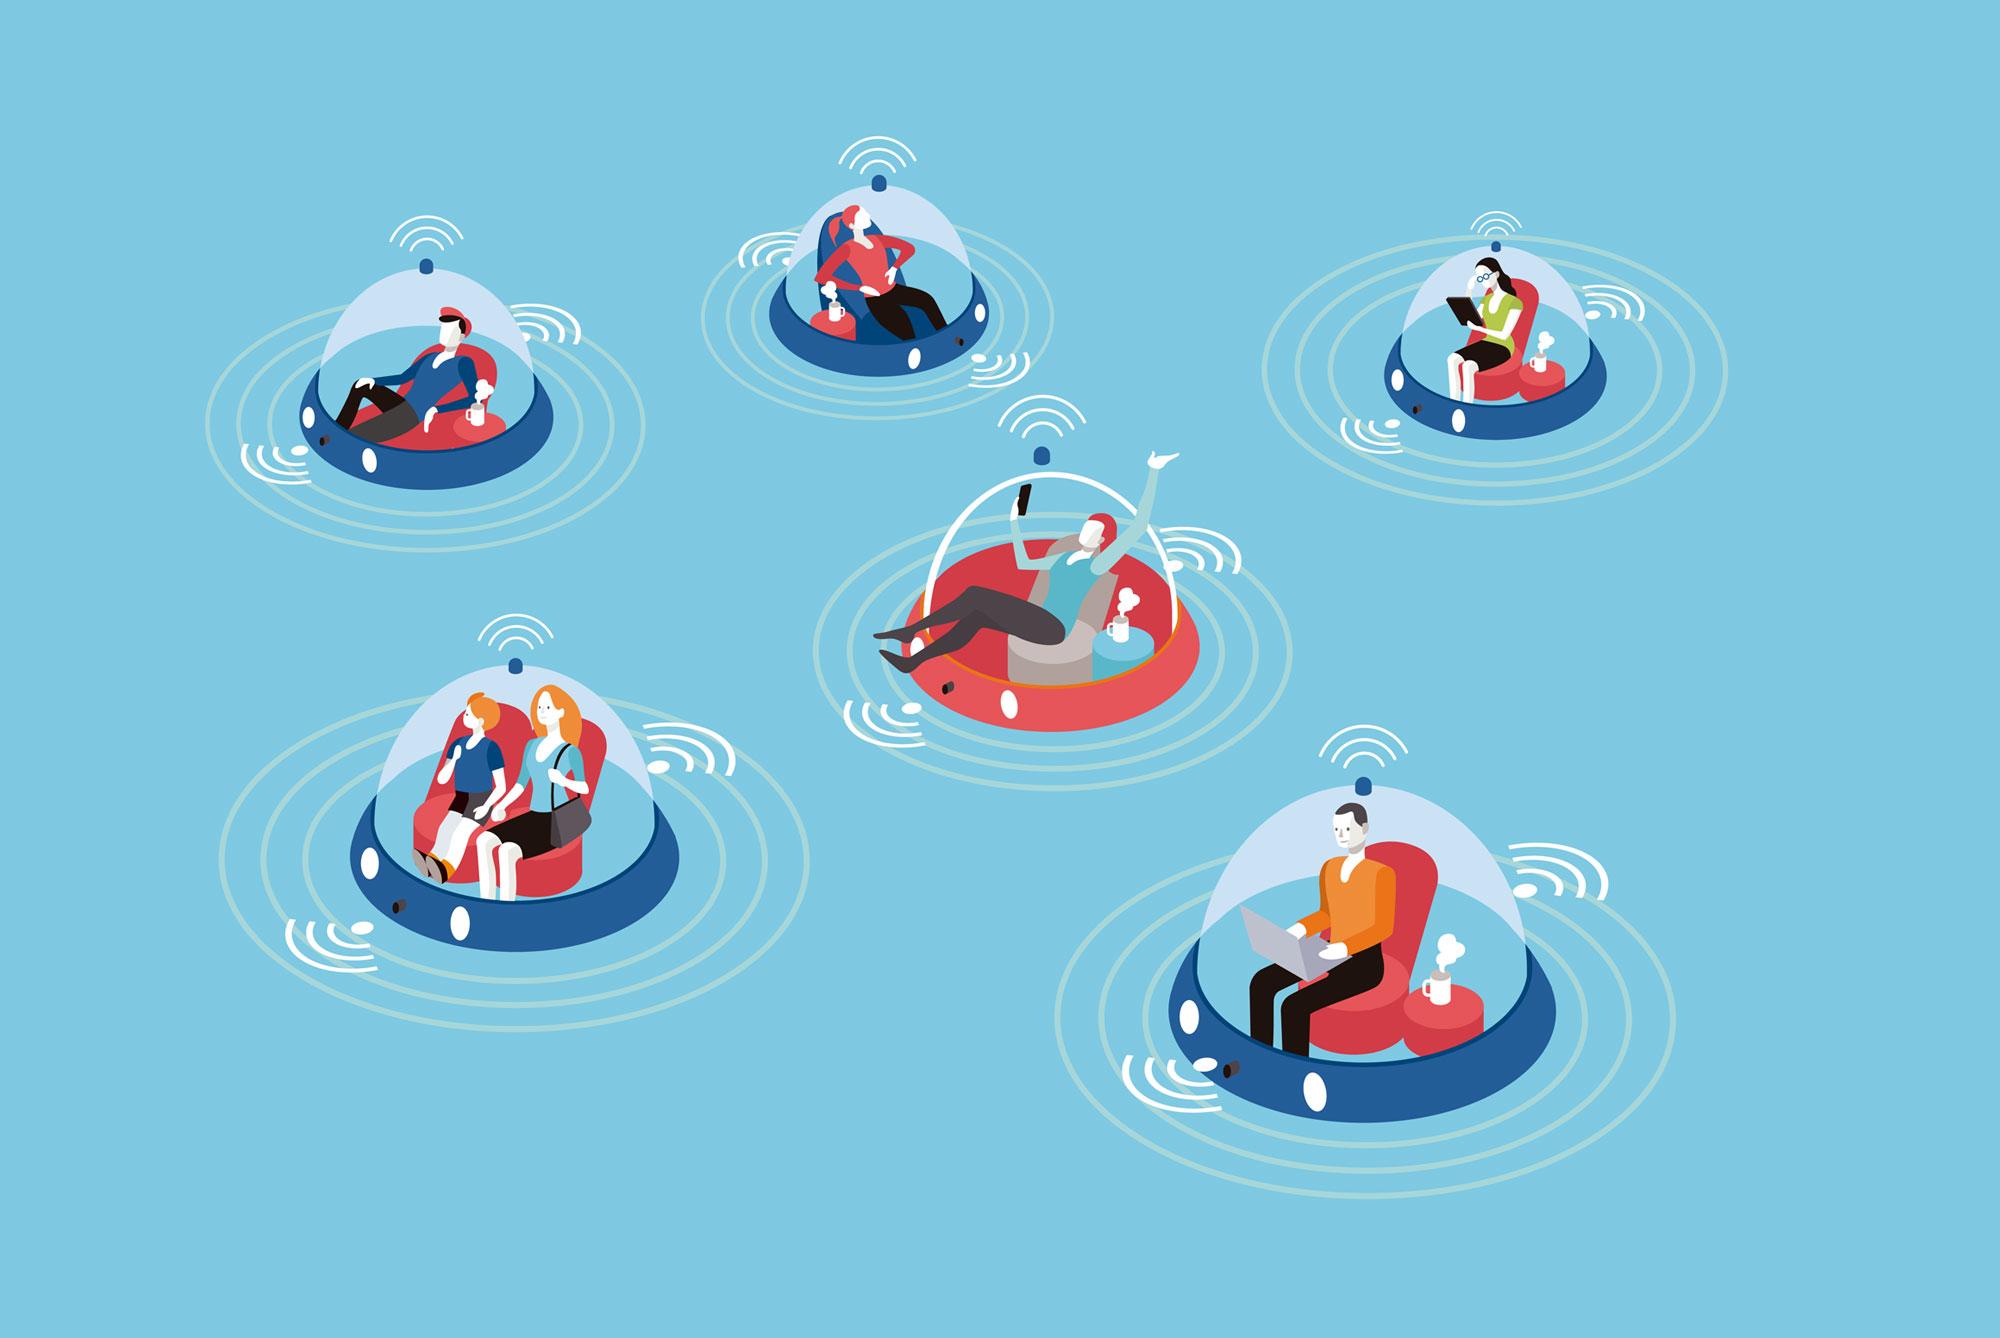 floating-spaceships-illustration